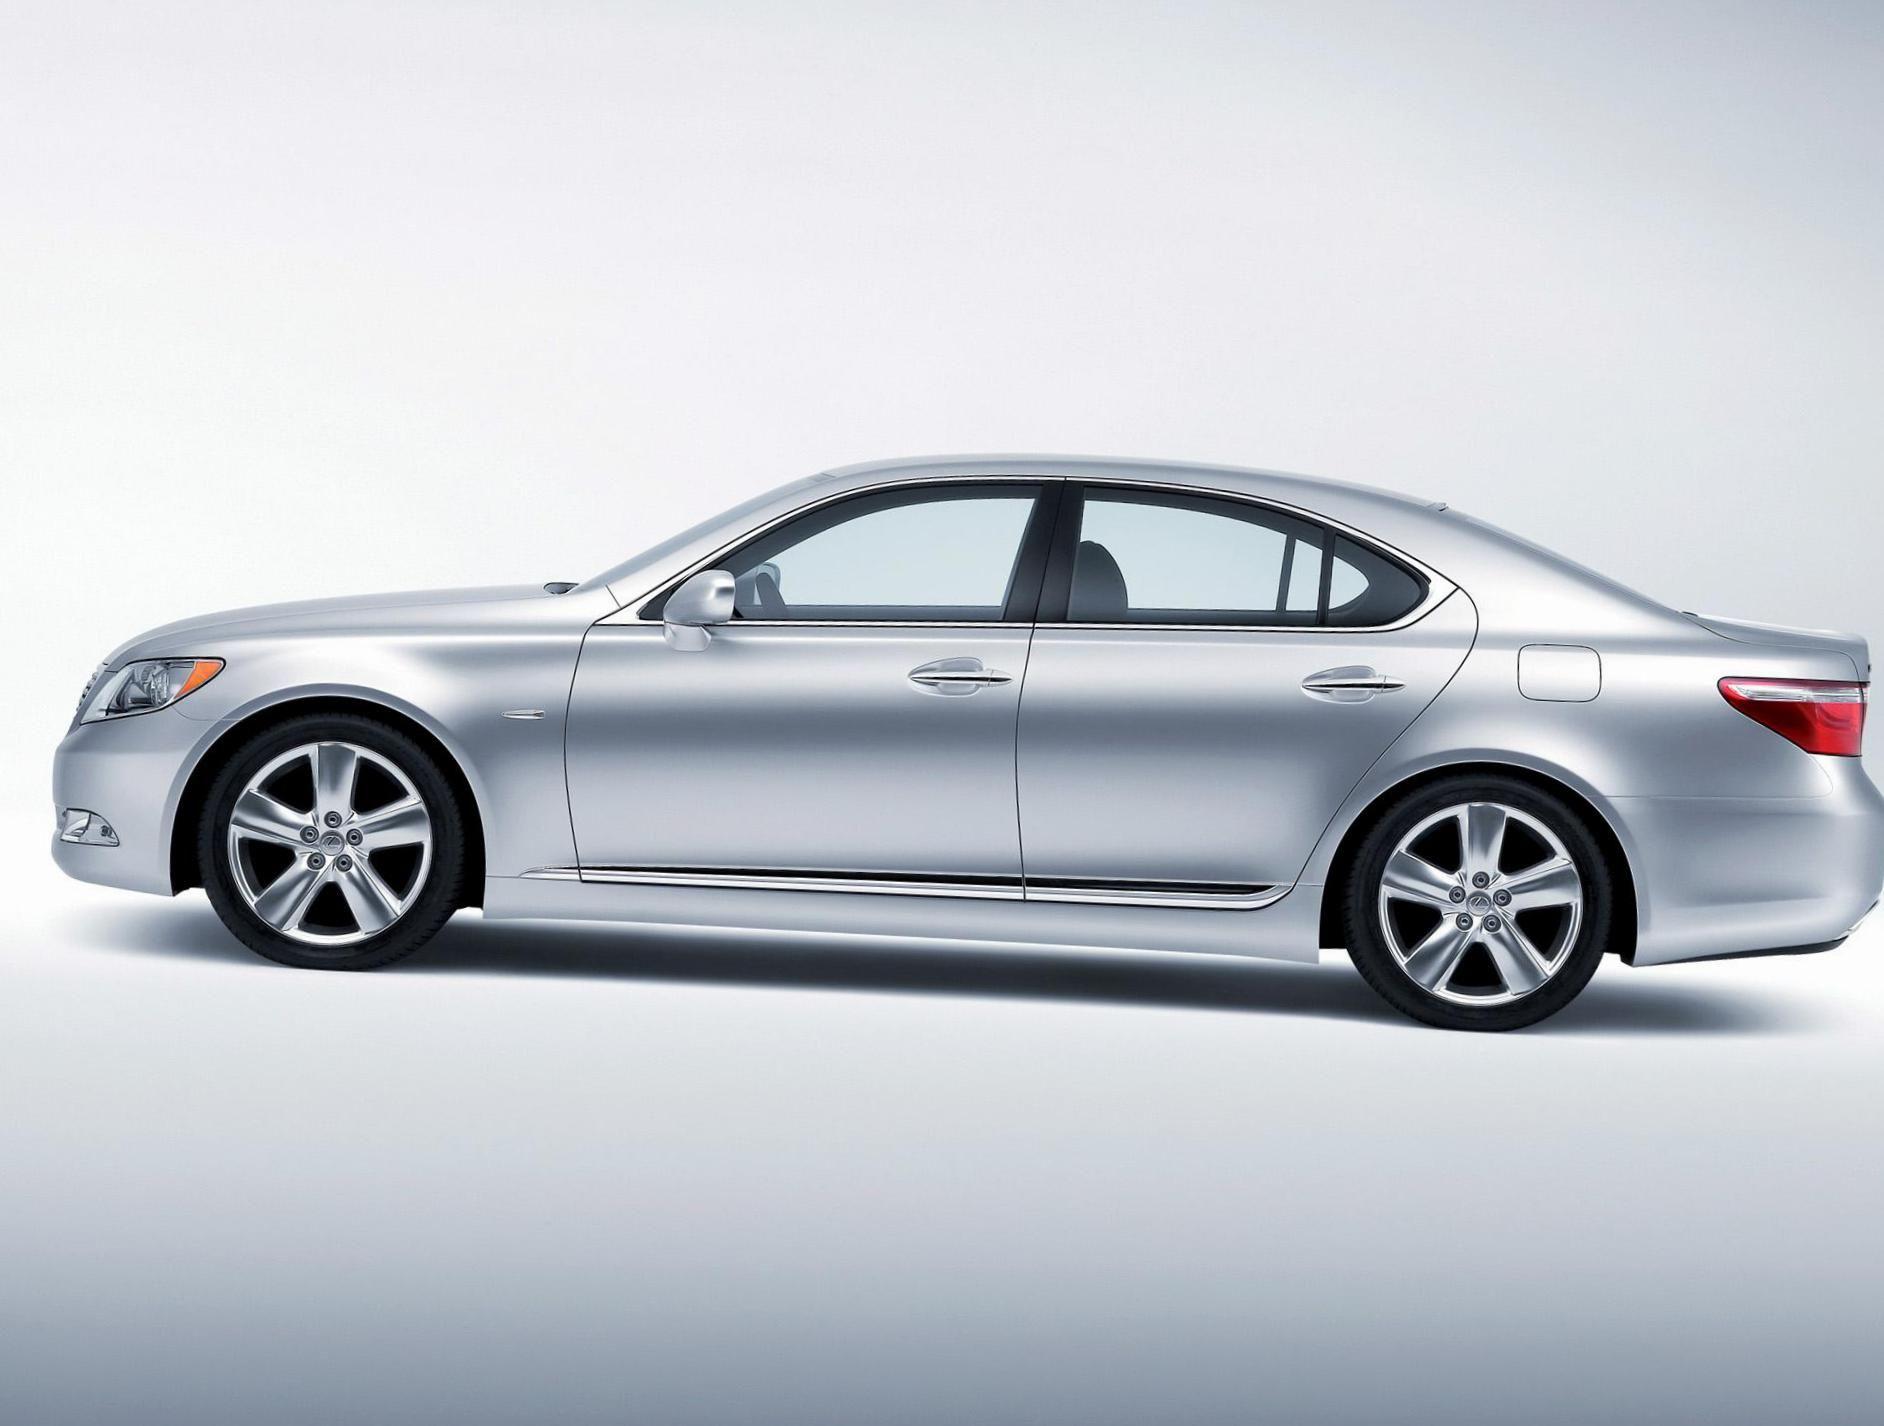 LS 460 Lexus lease Auto